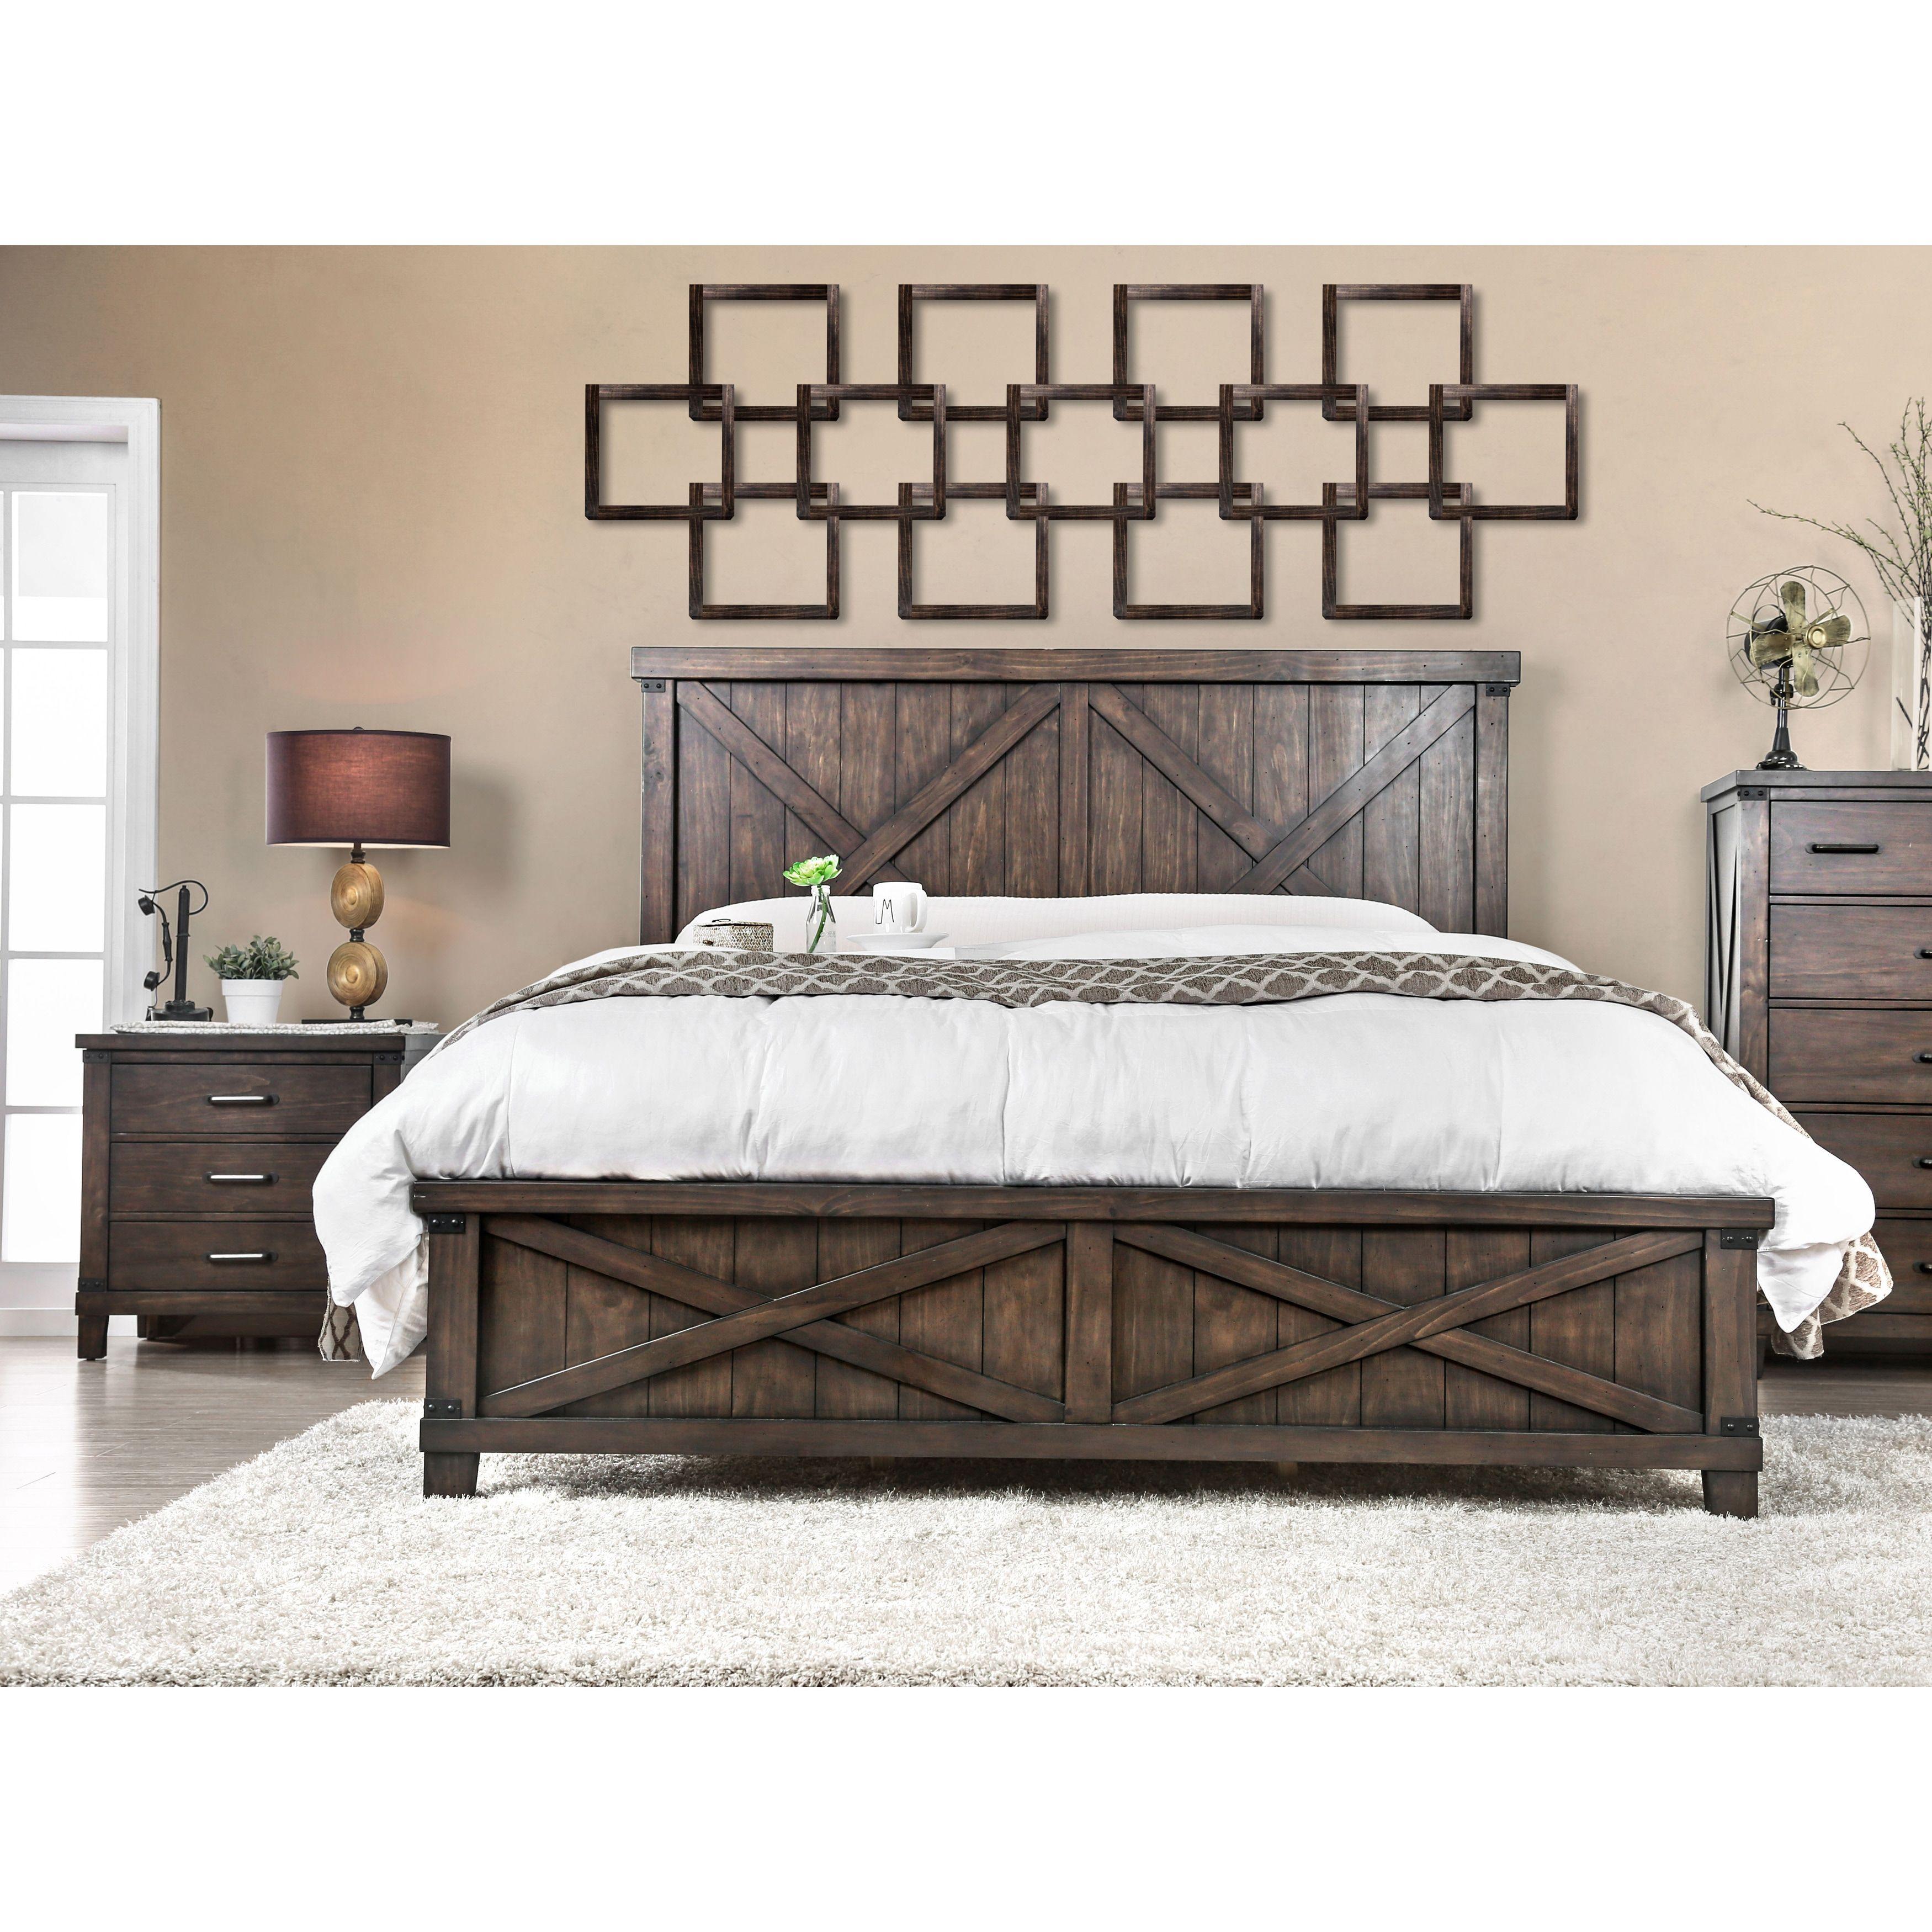 Furniture of America Hilande Rustic Farmhouse 2piece Dark